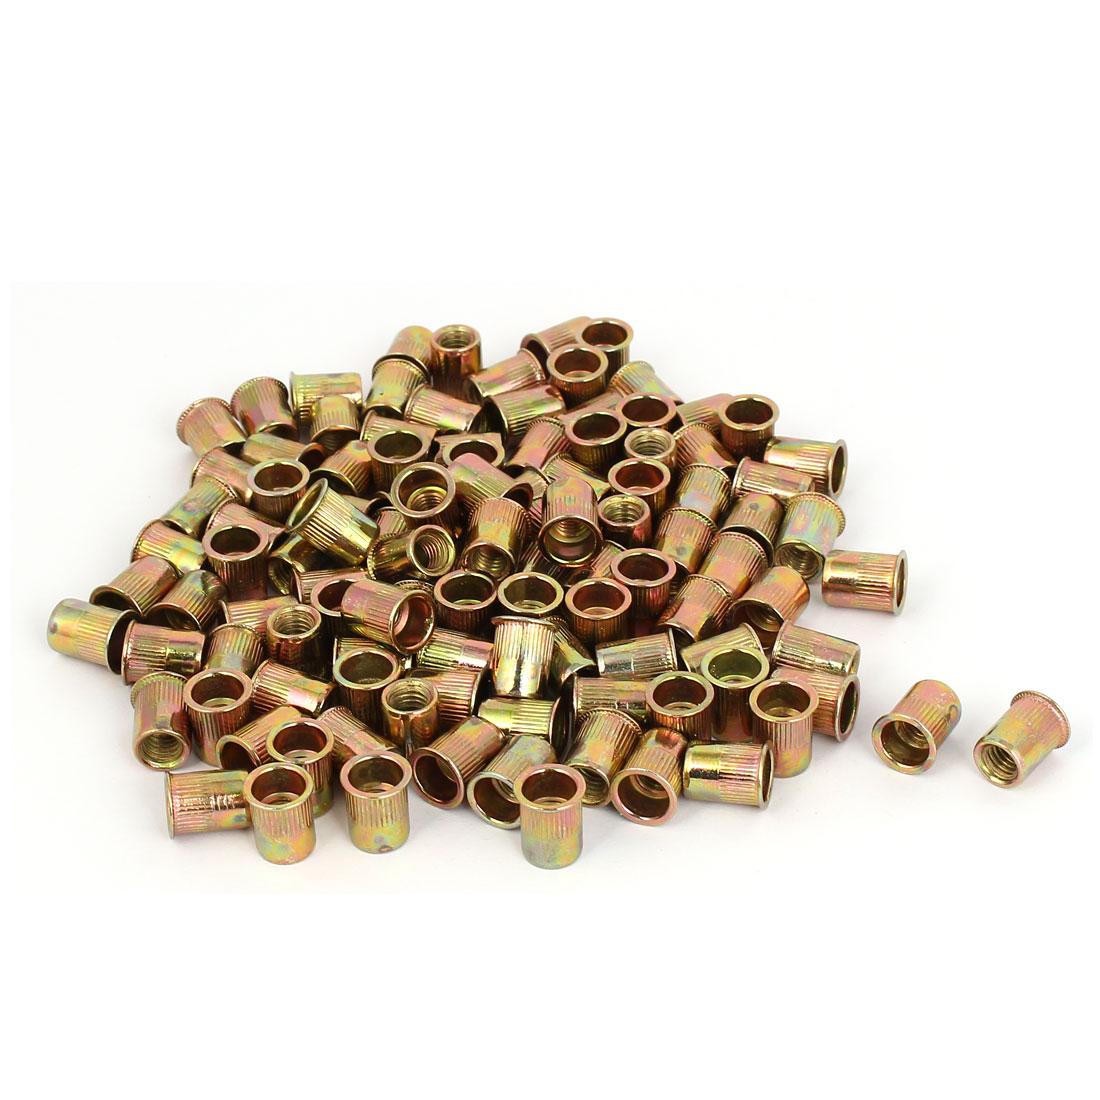 Carbon Steel Zinc Plated Straight Knurled Reduced Head Rivet Nut Nutsert Bronze Tone M6x12mm 100pcs